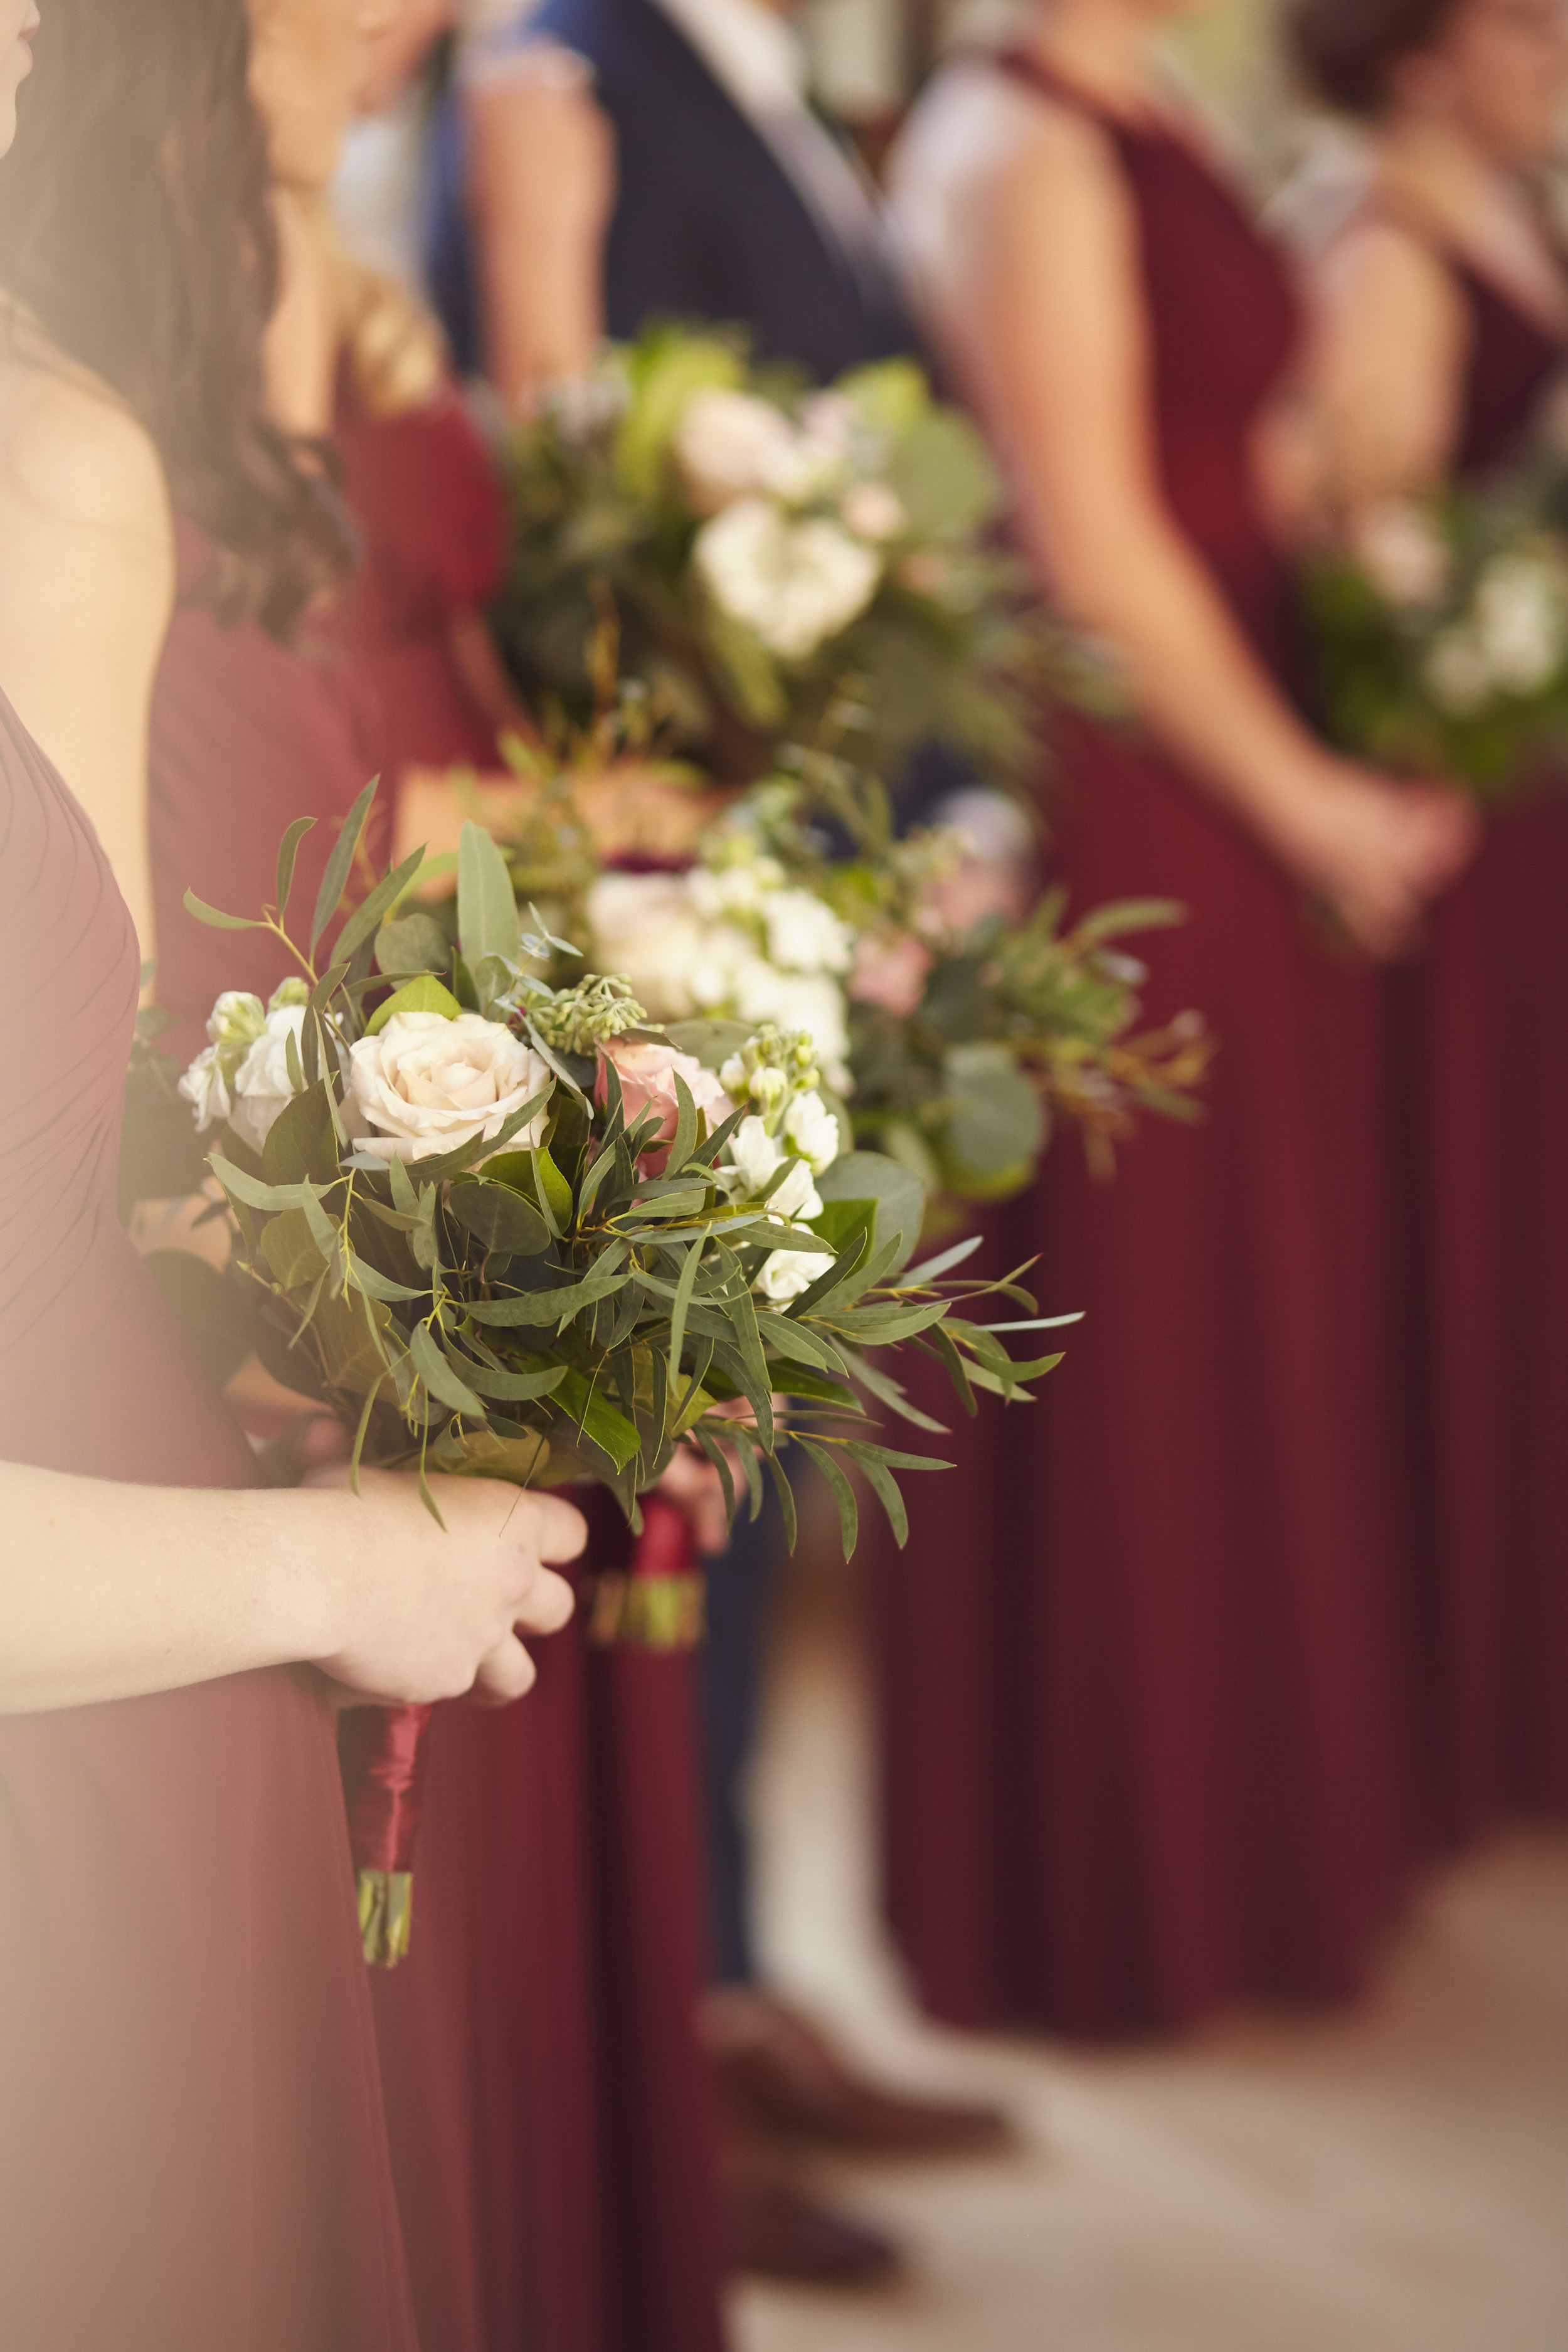 Jen & Ben Wedding - benromangphoto - 6I5A3625.jpg